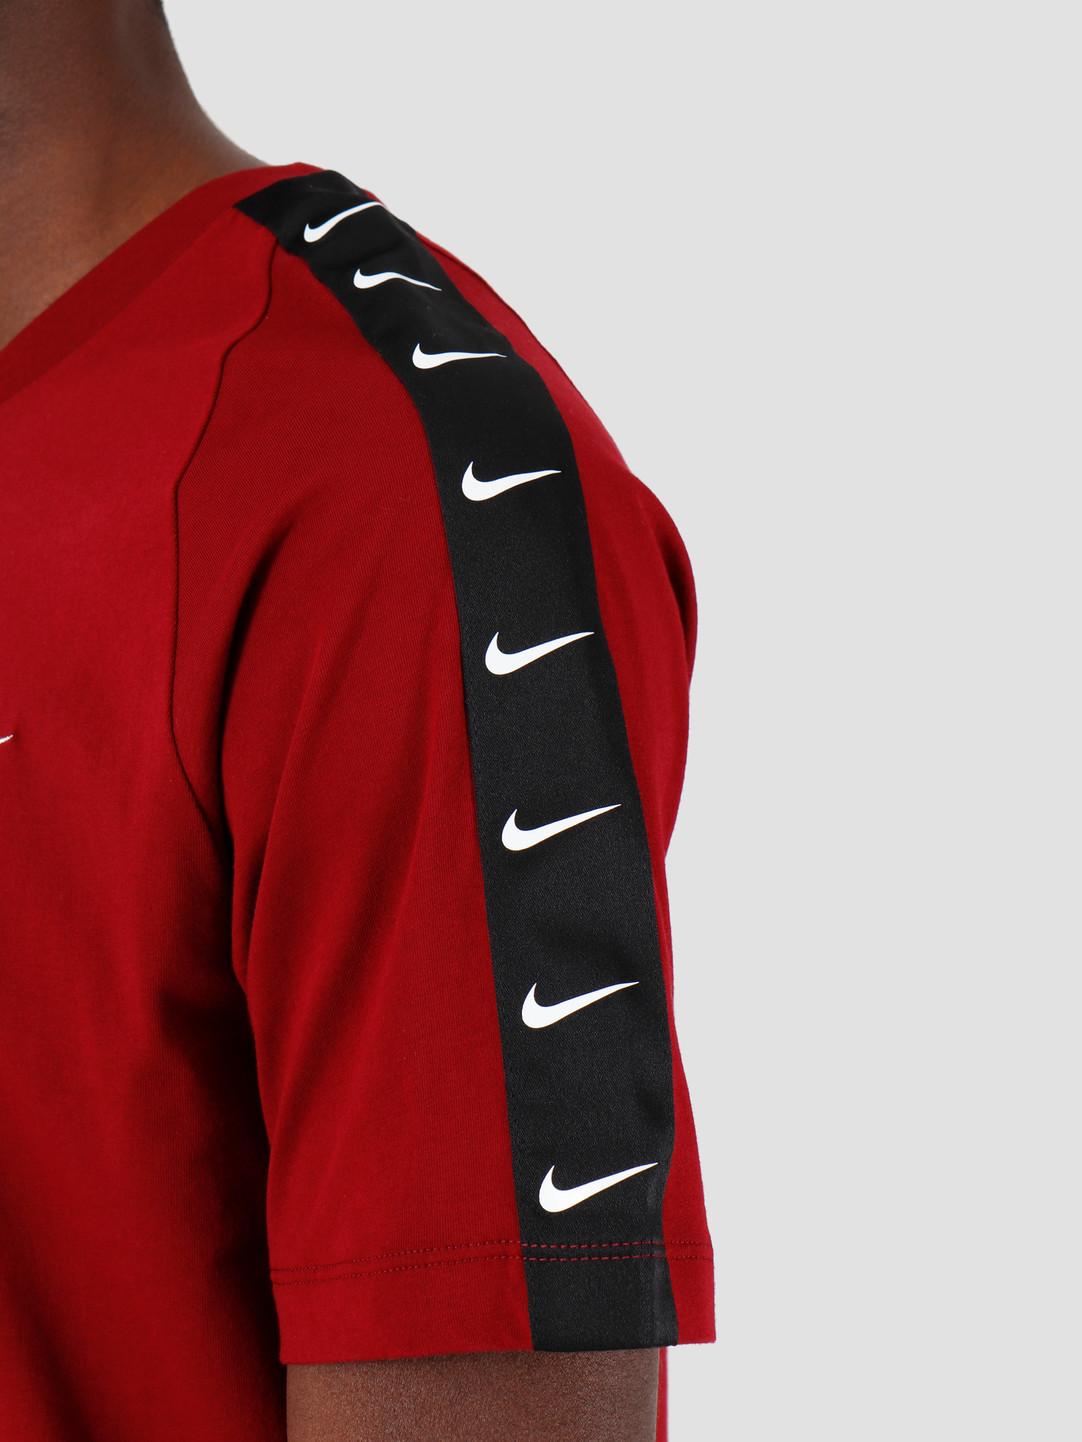 Nike Nike NSW T-Shirt Hbr Swoosh 2 Tea Red White BQ0024-677